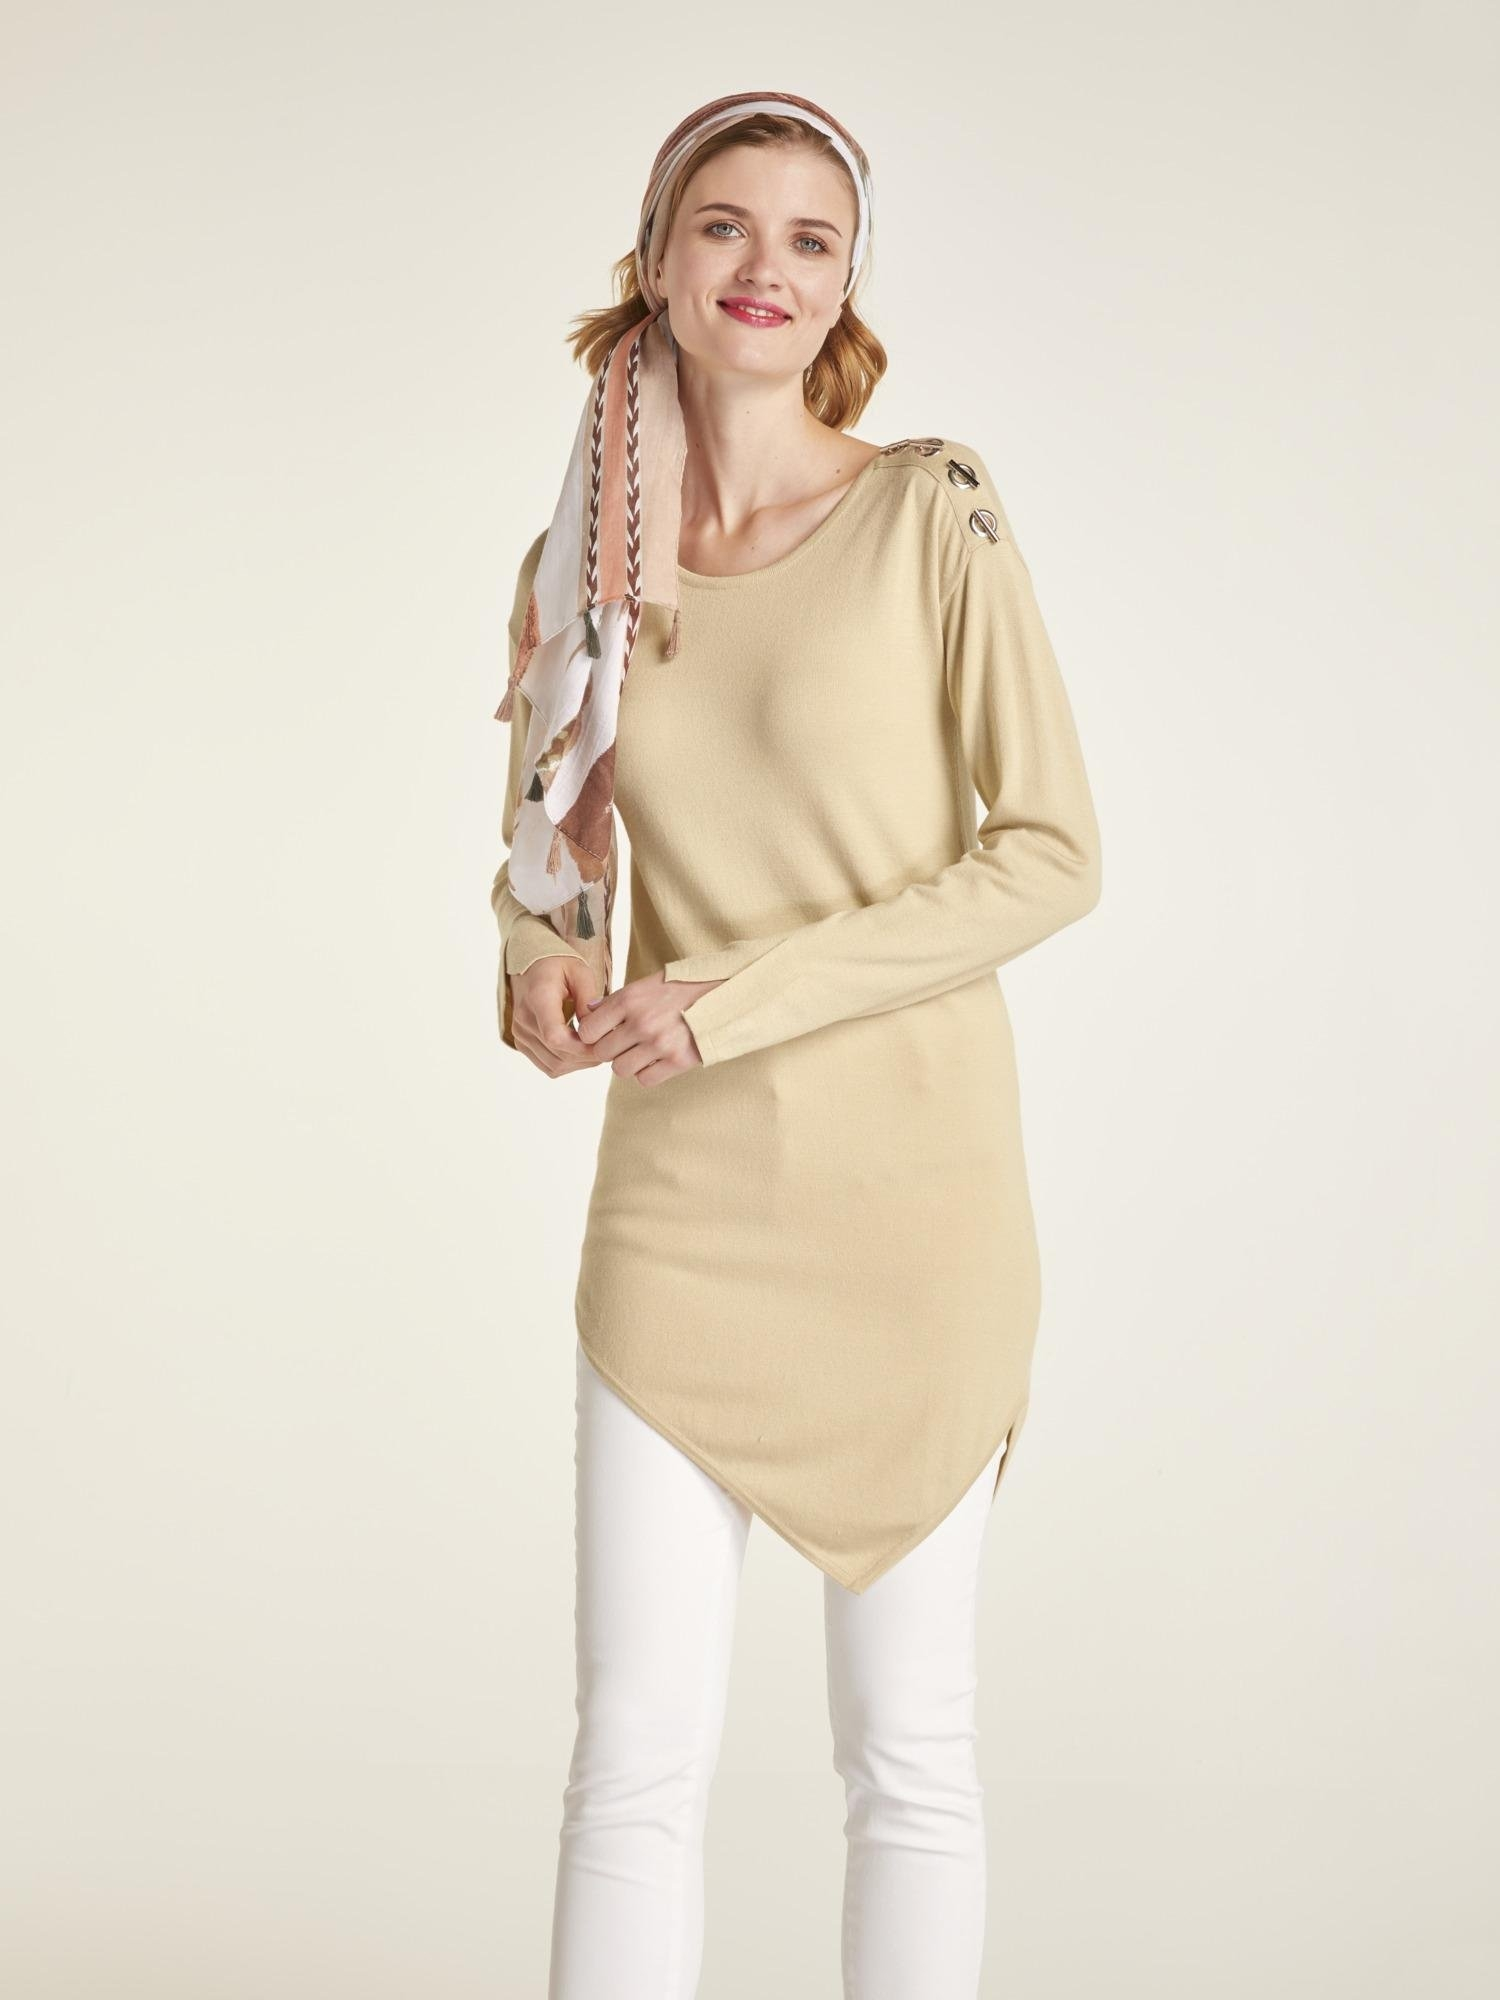 Bij Online Online Online Online Pullover Bij Pullover Online Bij Pullover Pullover Bij Pullover Bij zMSUpGqV